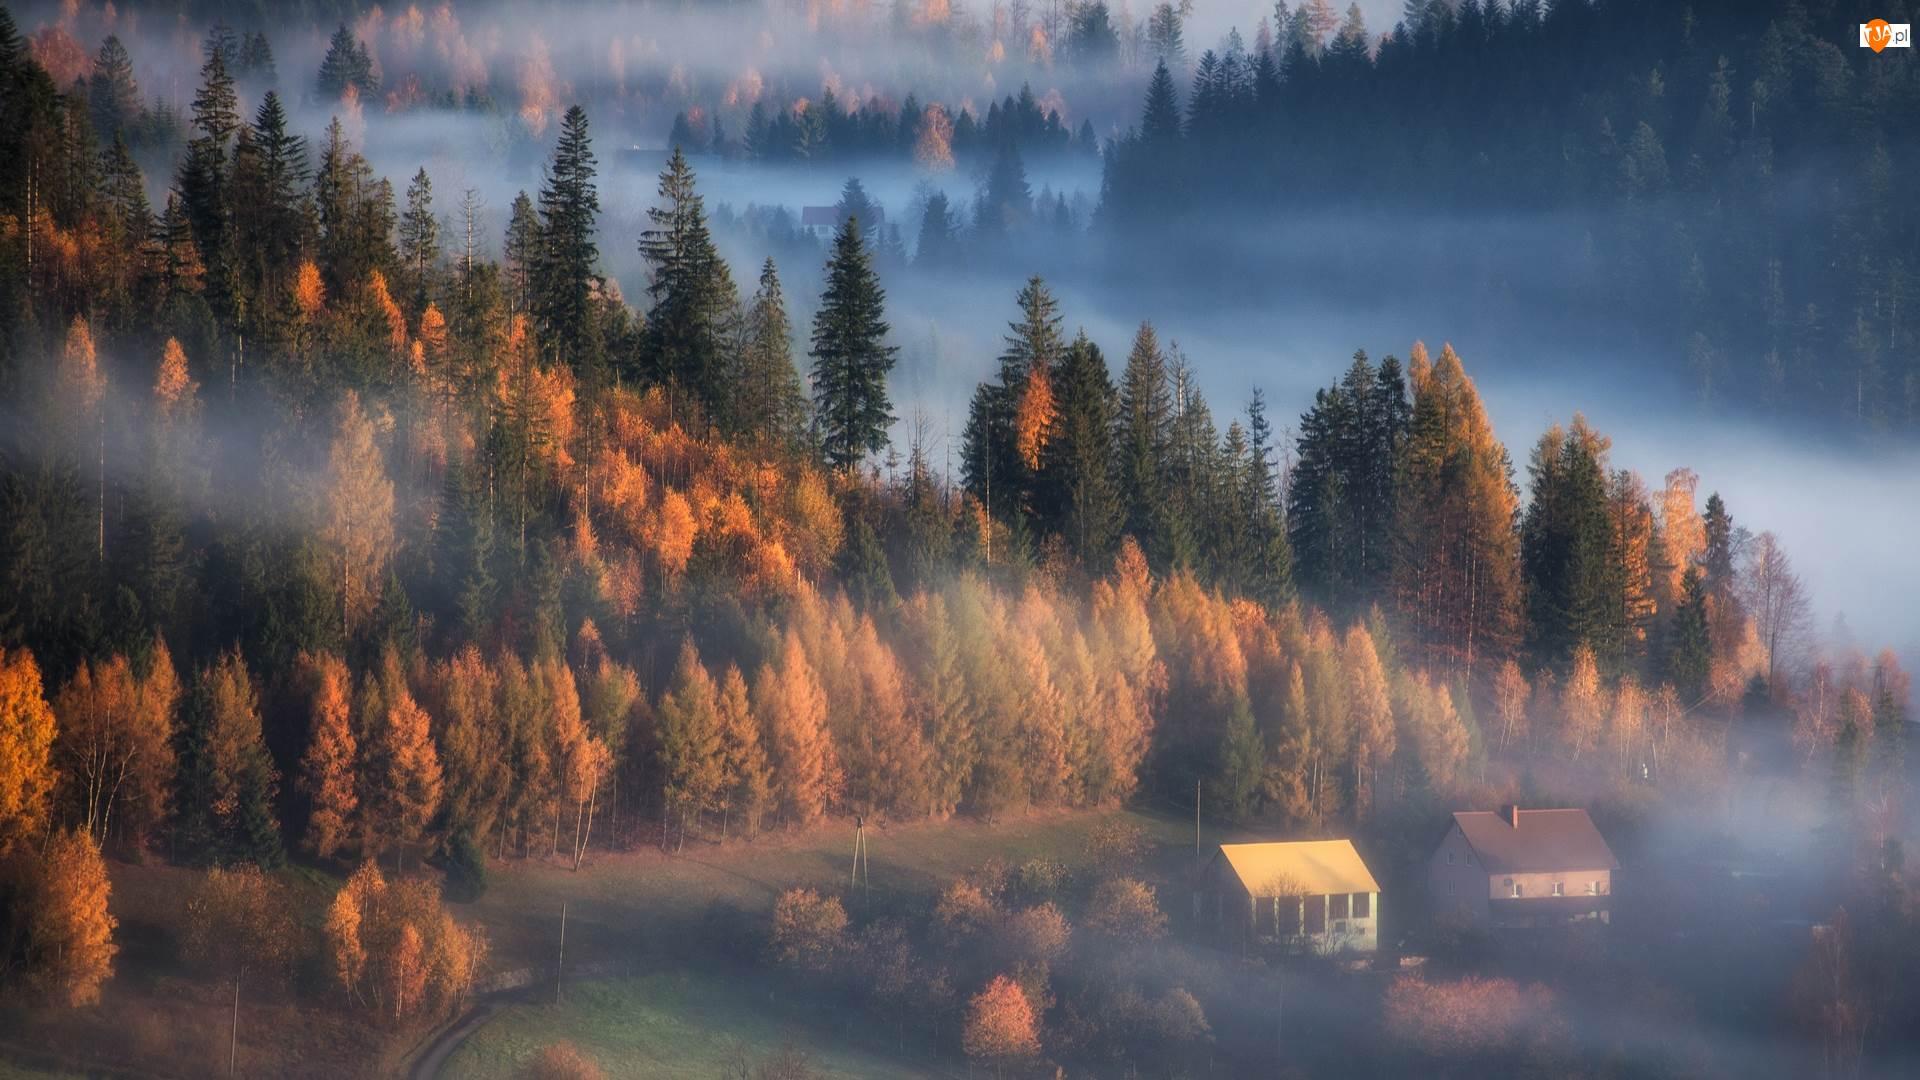 Domy, Jesień, Las, Mgła